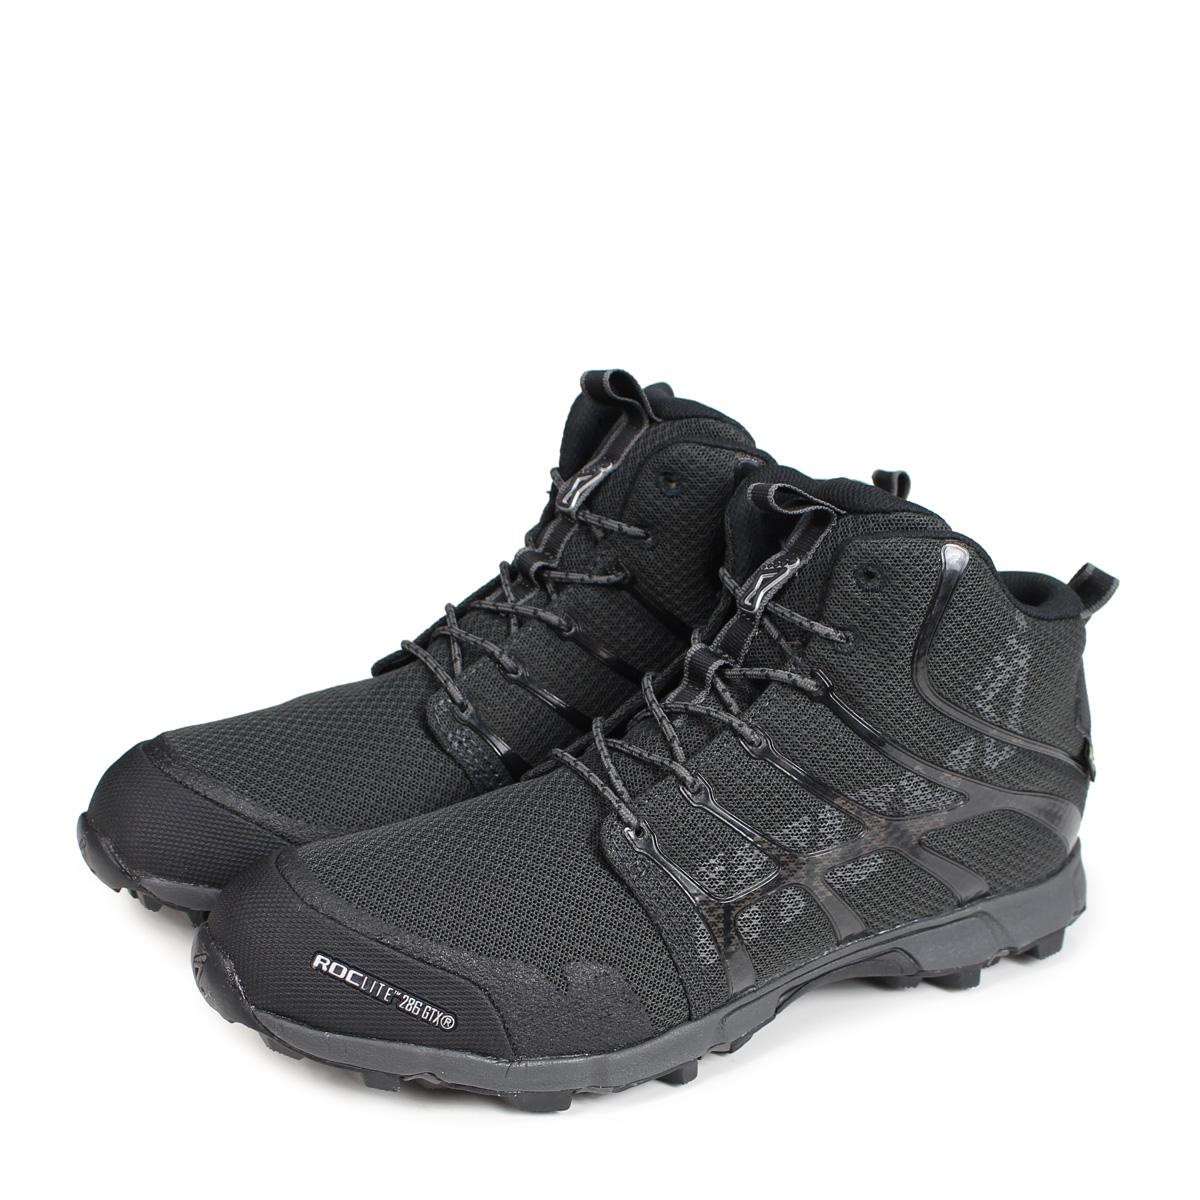 inov-8 ROCLITE 286 GTX UNI イノヴェイト ロックライト シューズ トレイルランニングシューズ靴 IVT2525U2 メンズ ブラック [189]